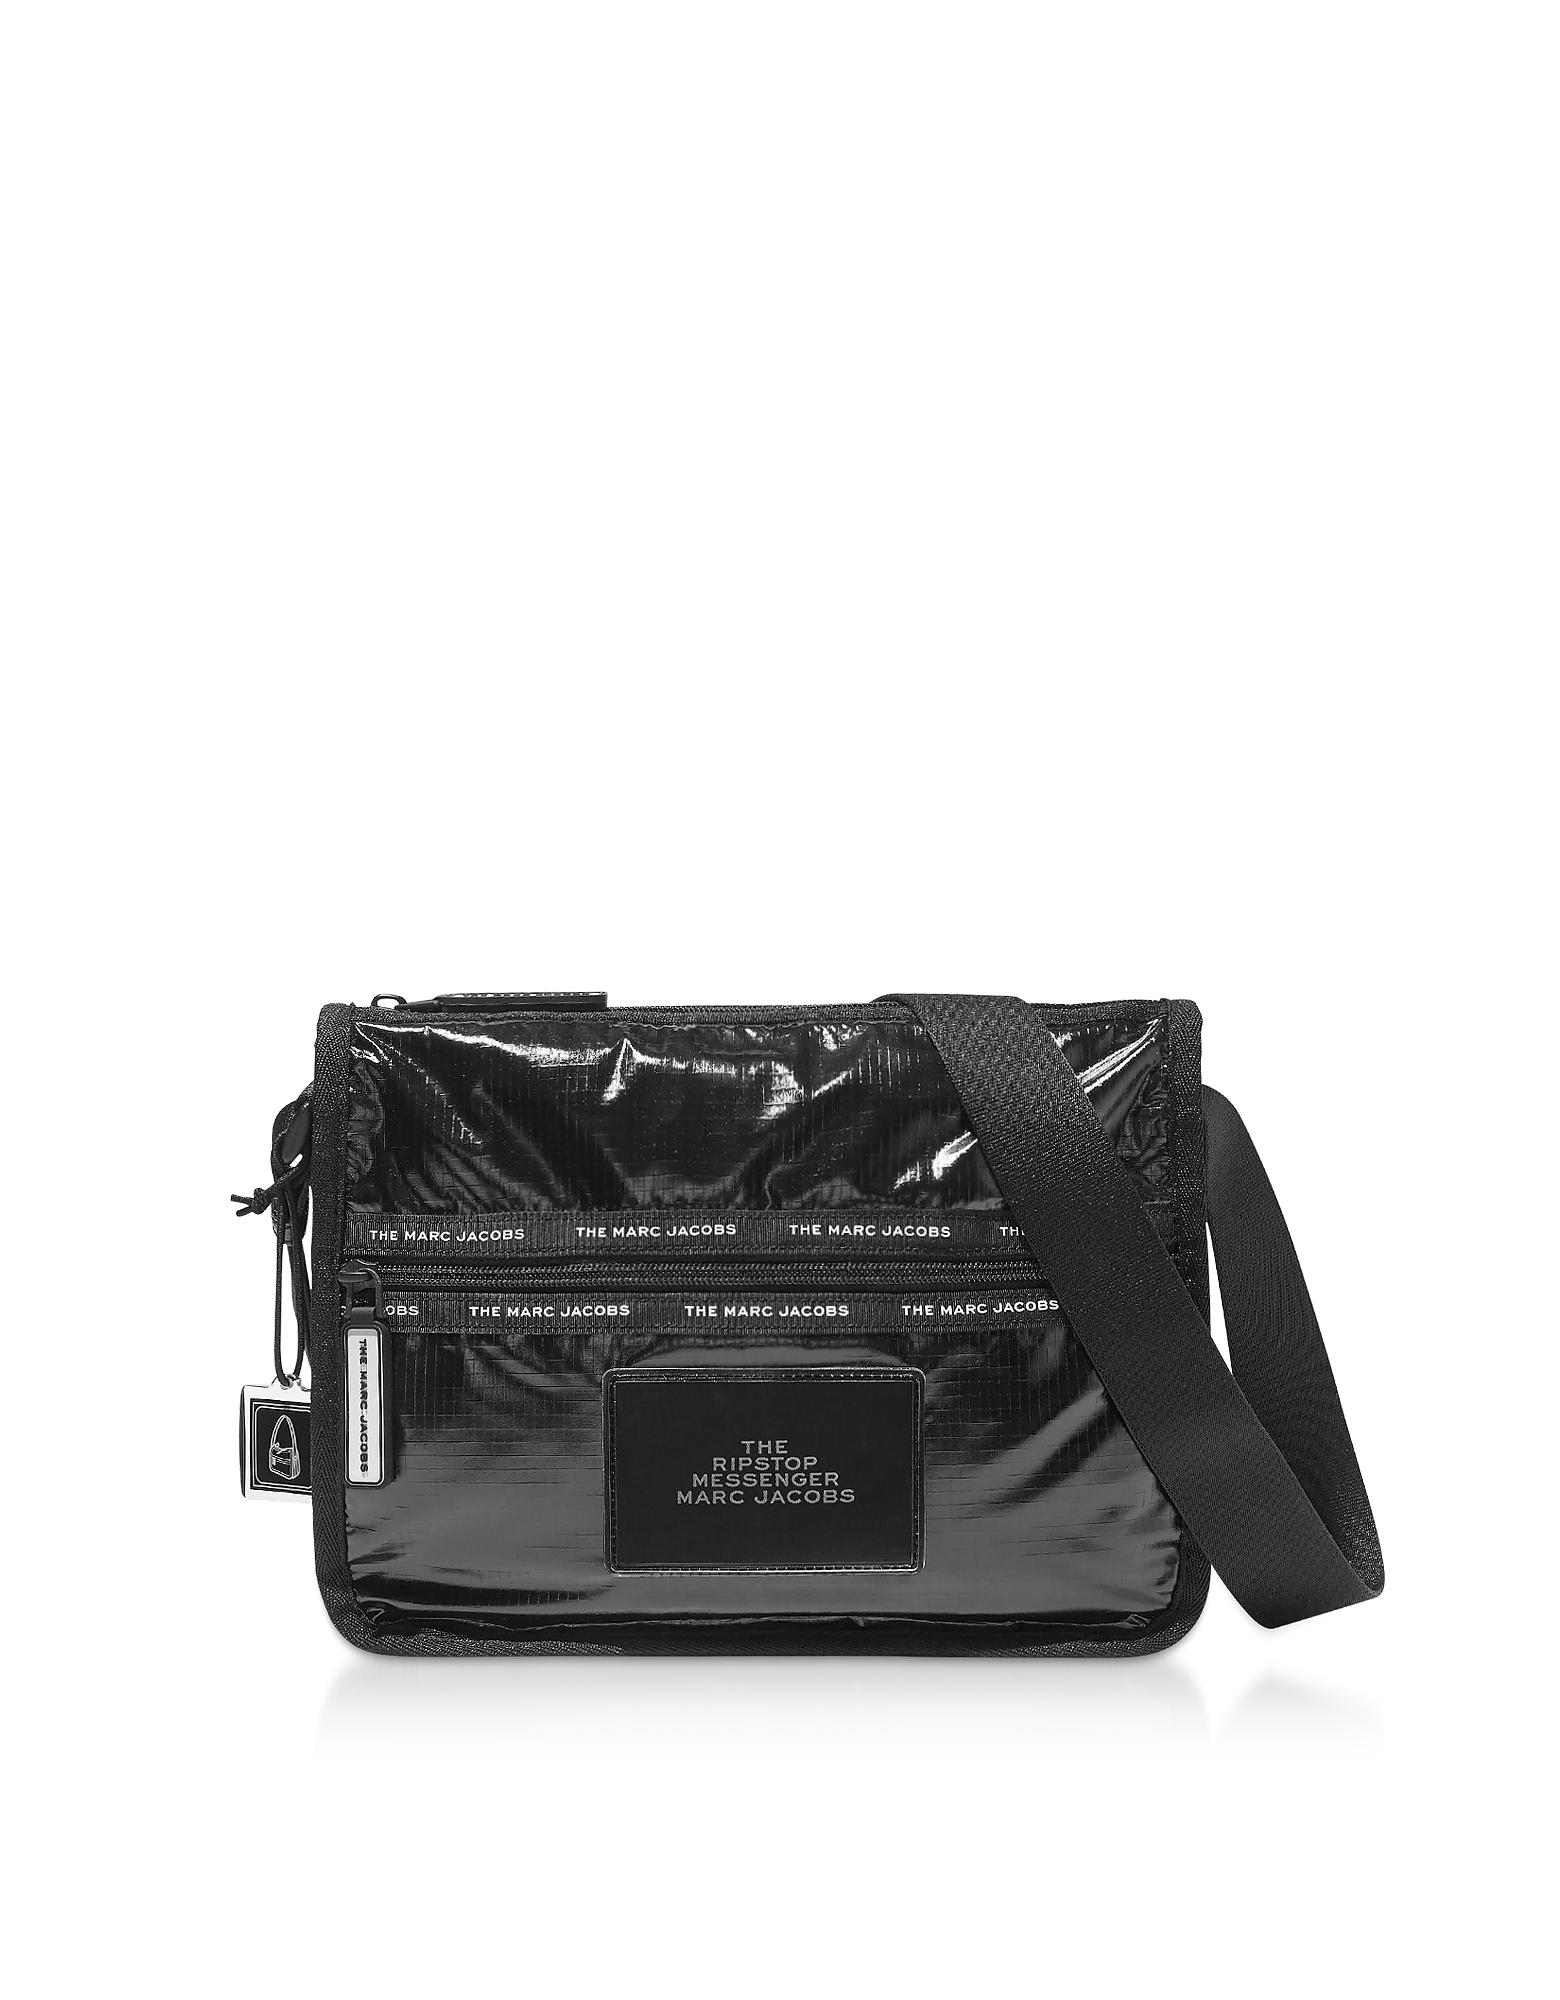 Marc Jacobs  Handbags The Ripstop Black Nylon Messenger Bag